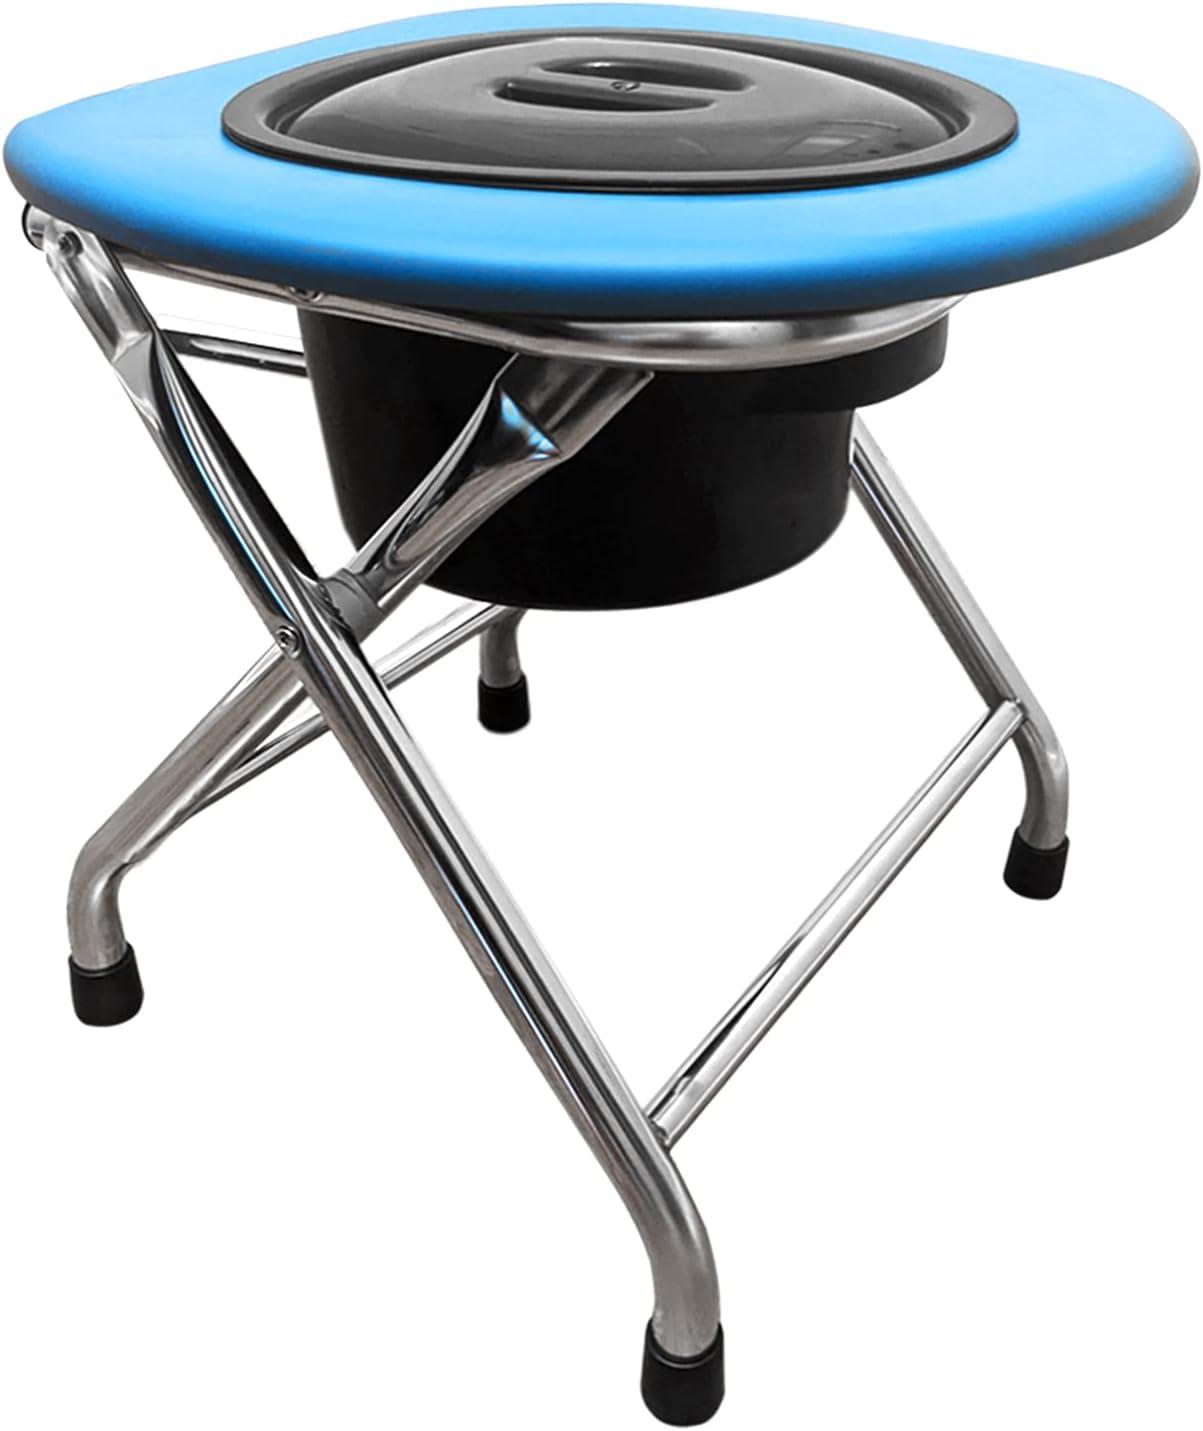 Kunida Designs Portable 送料込 Camping Toilet with Bucket - Chair Foldi 激安格安割引情報満載